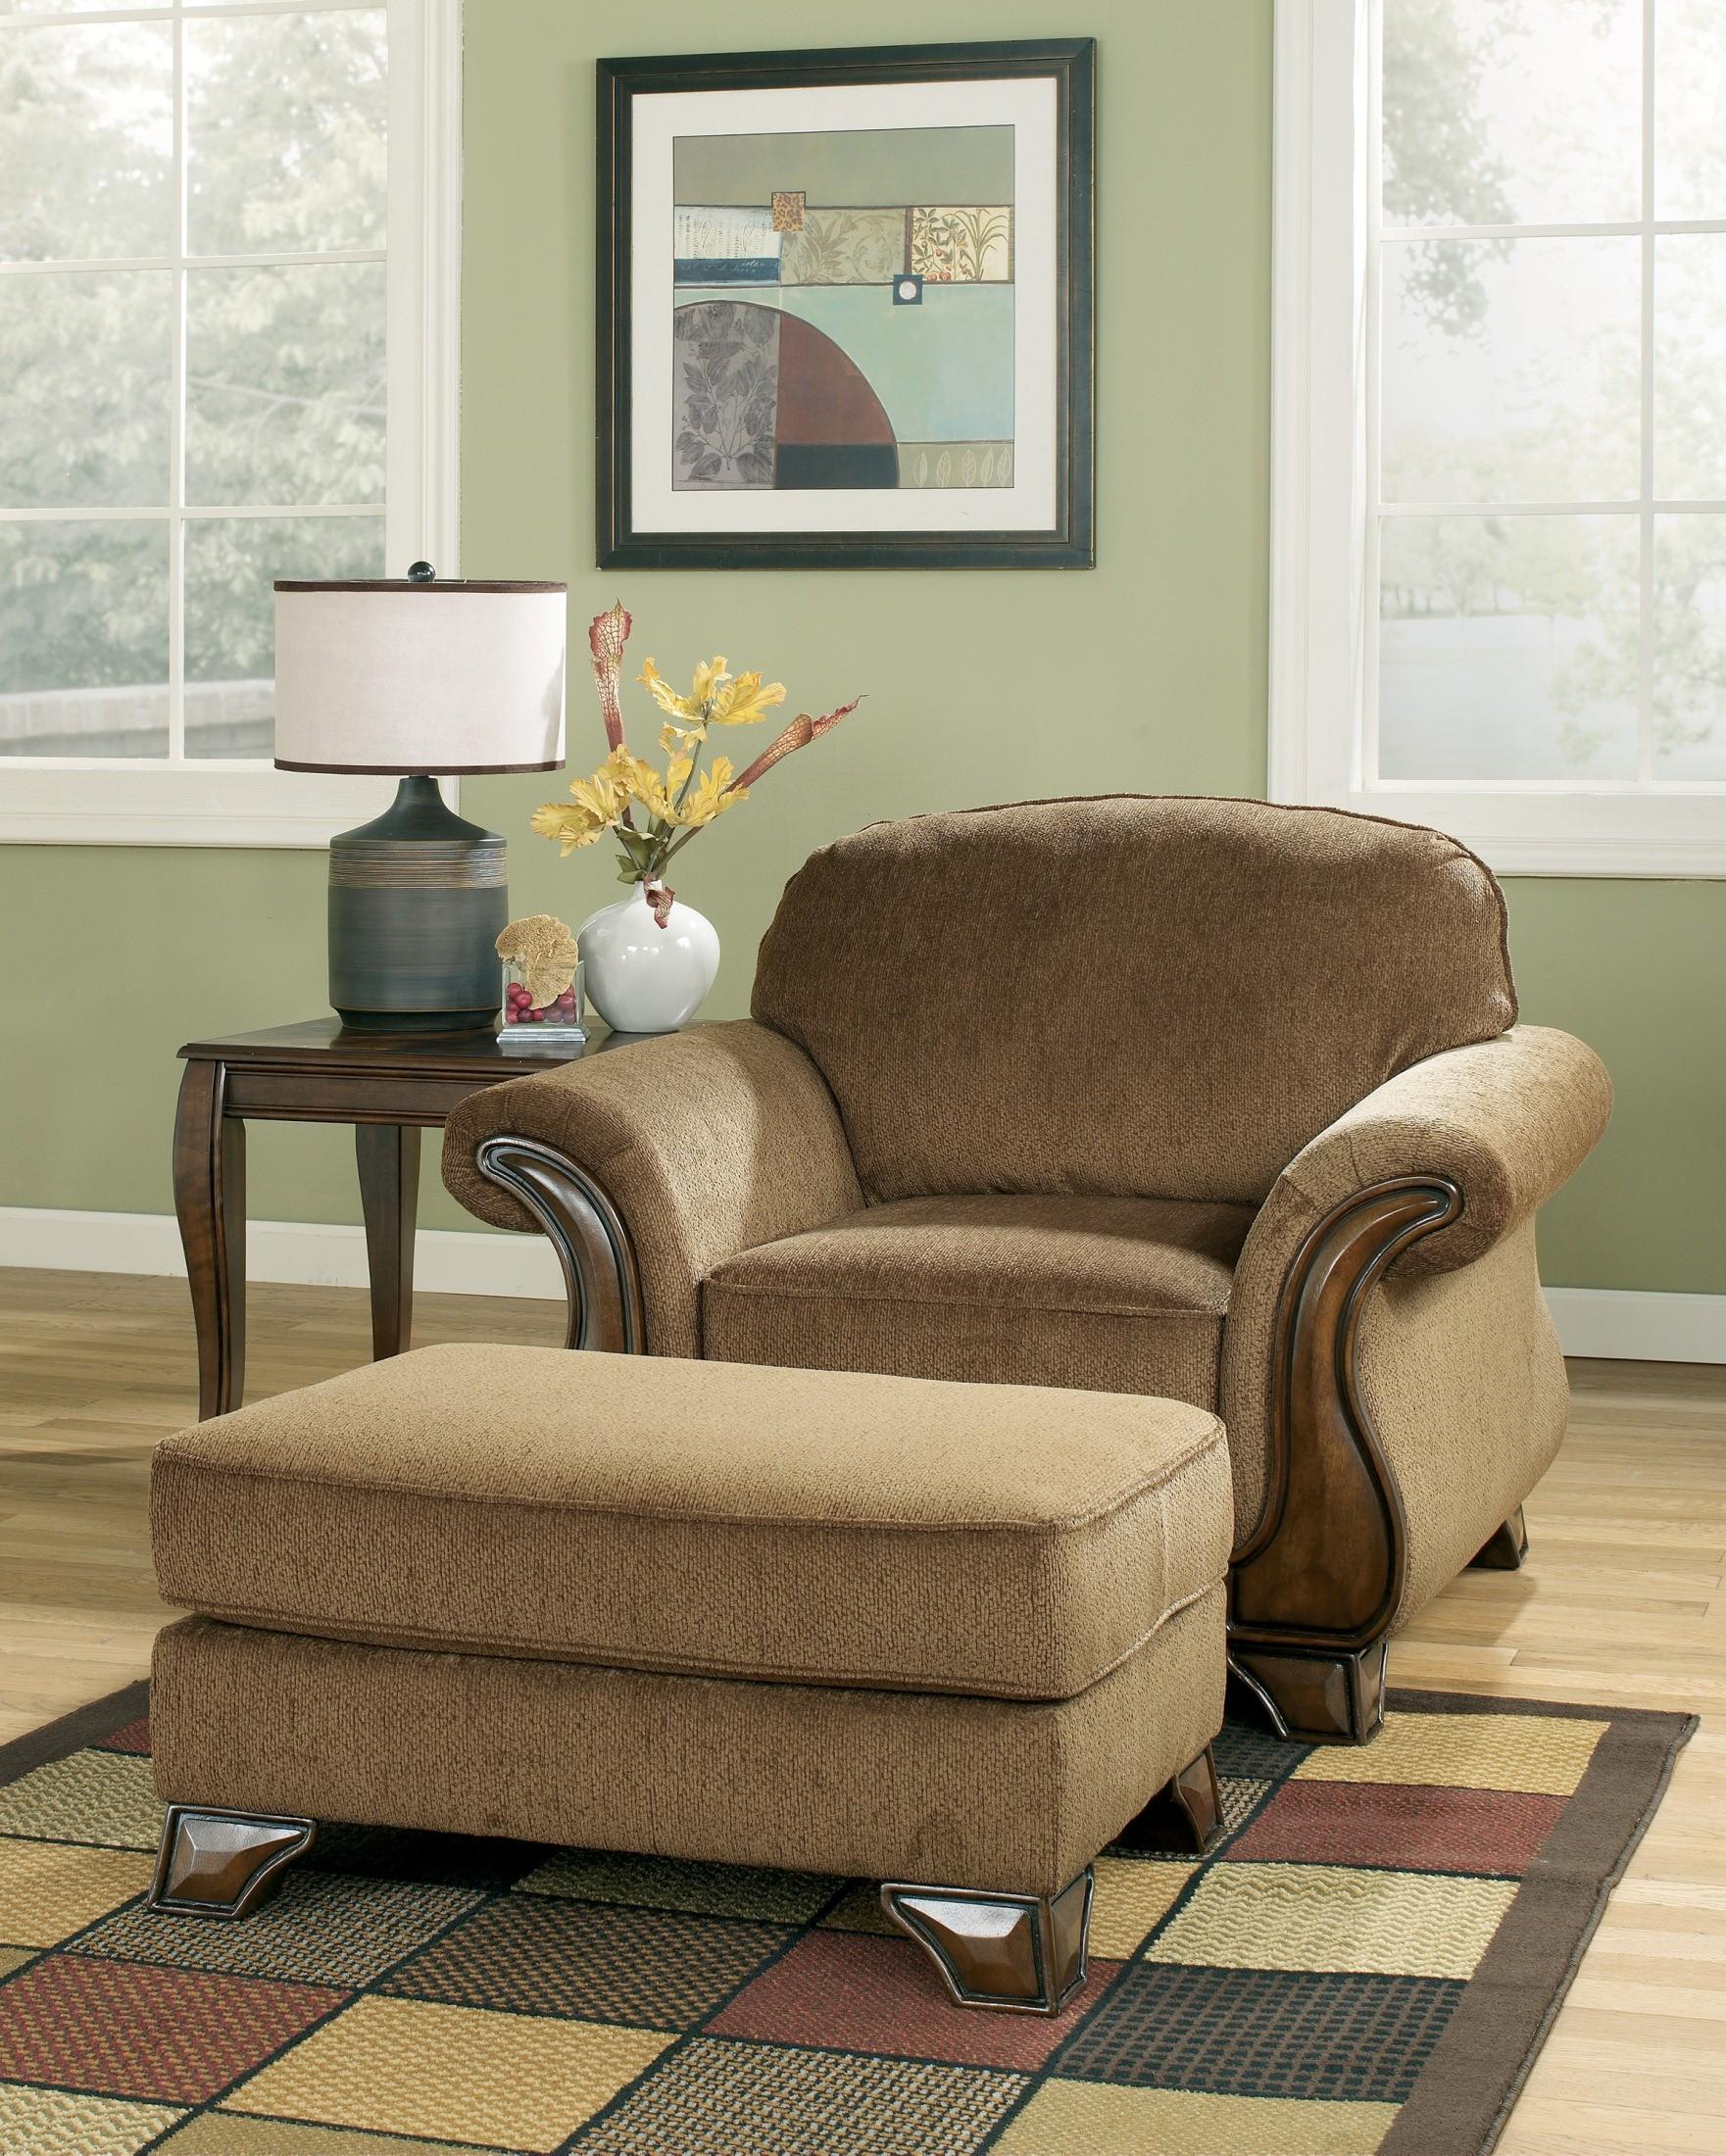 montgomery mocha living room set from ashley 3830038 coleman furniture. Black Bedroom Furniture Sets. Home Design Ideas